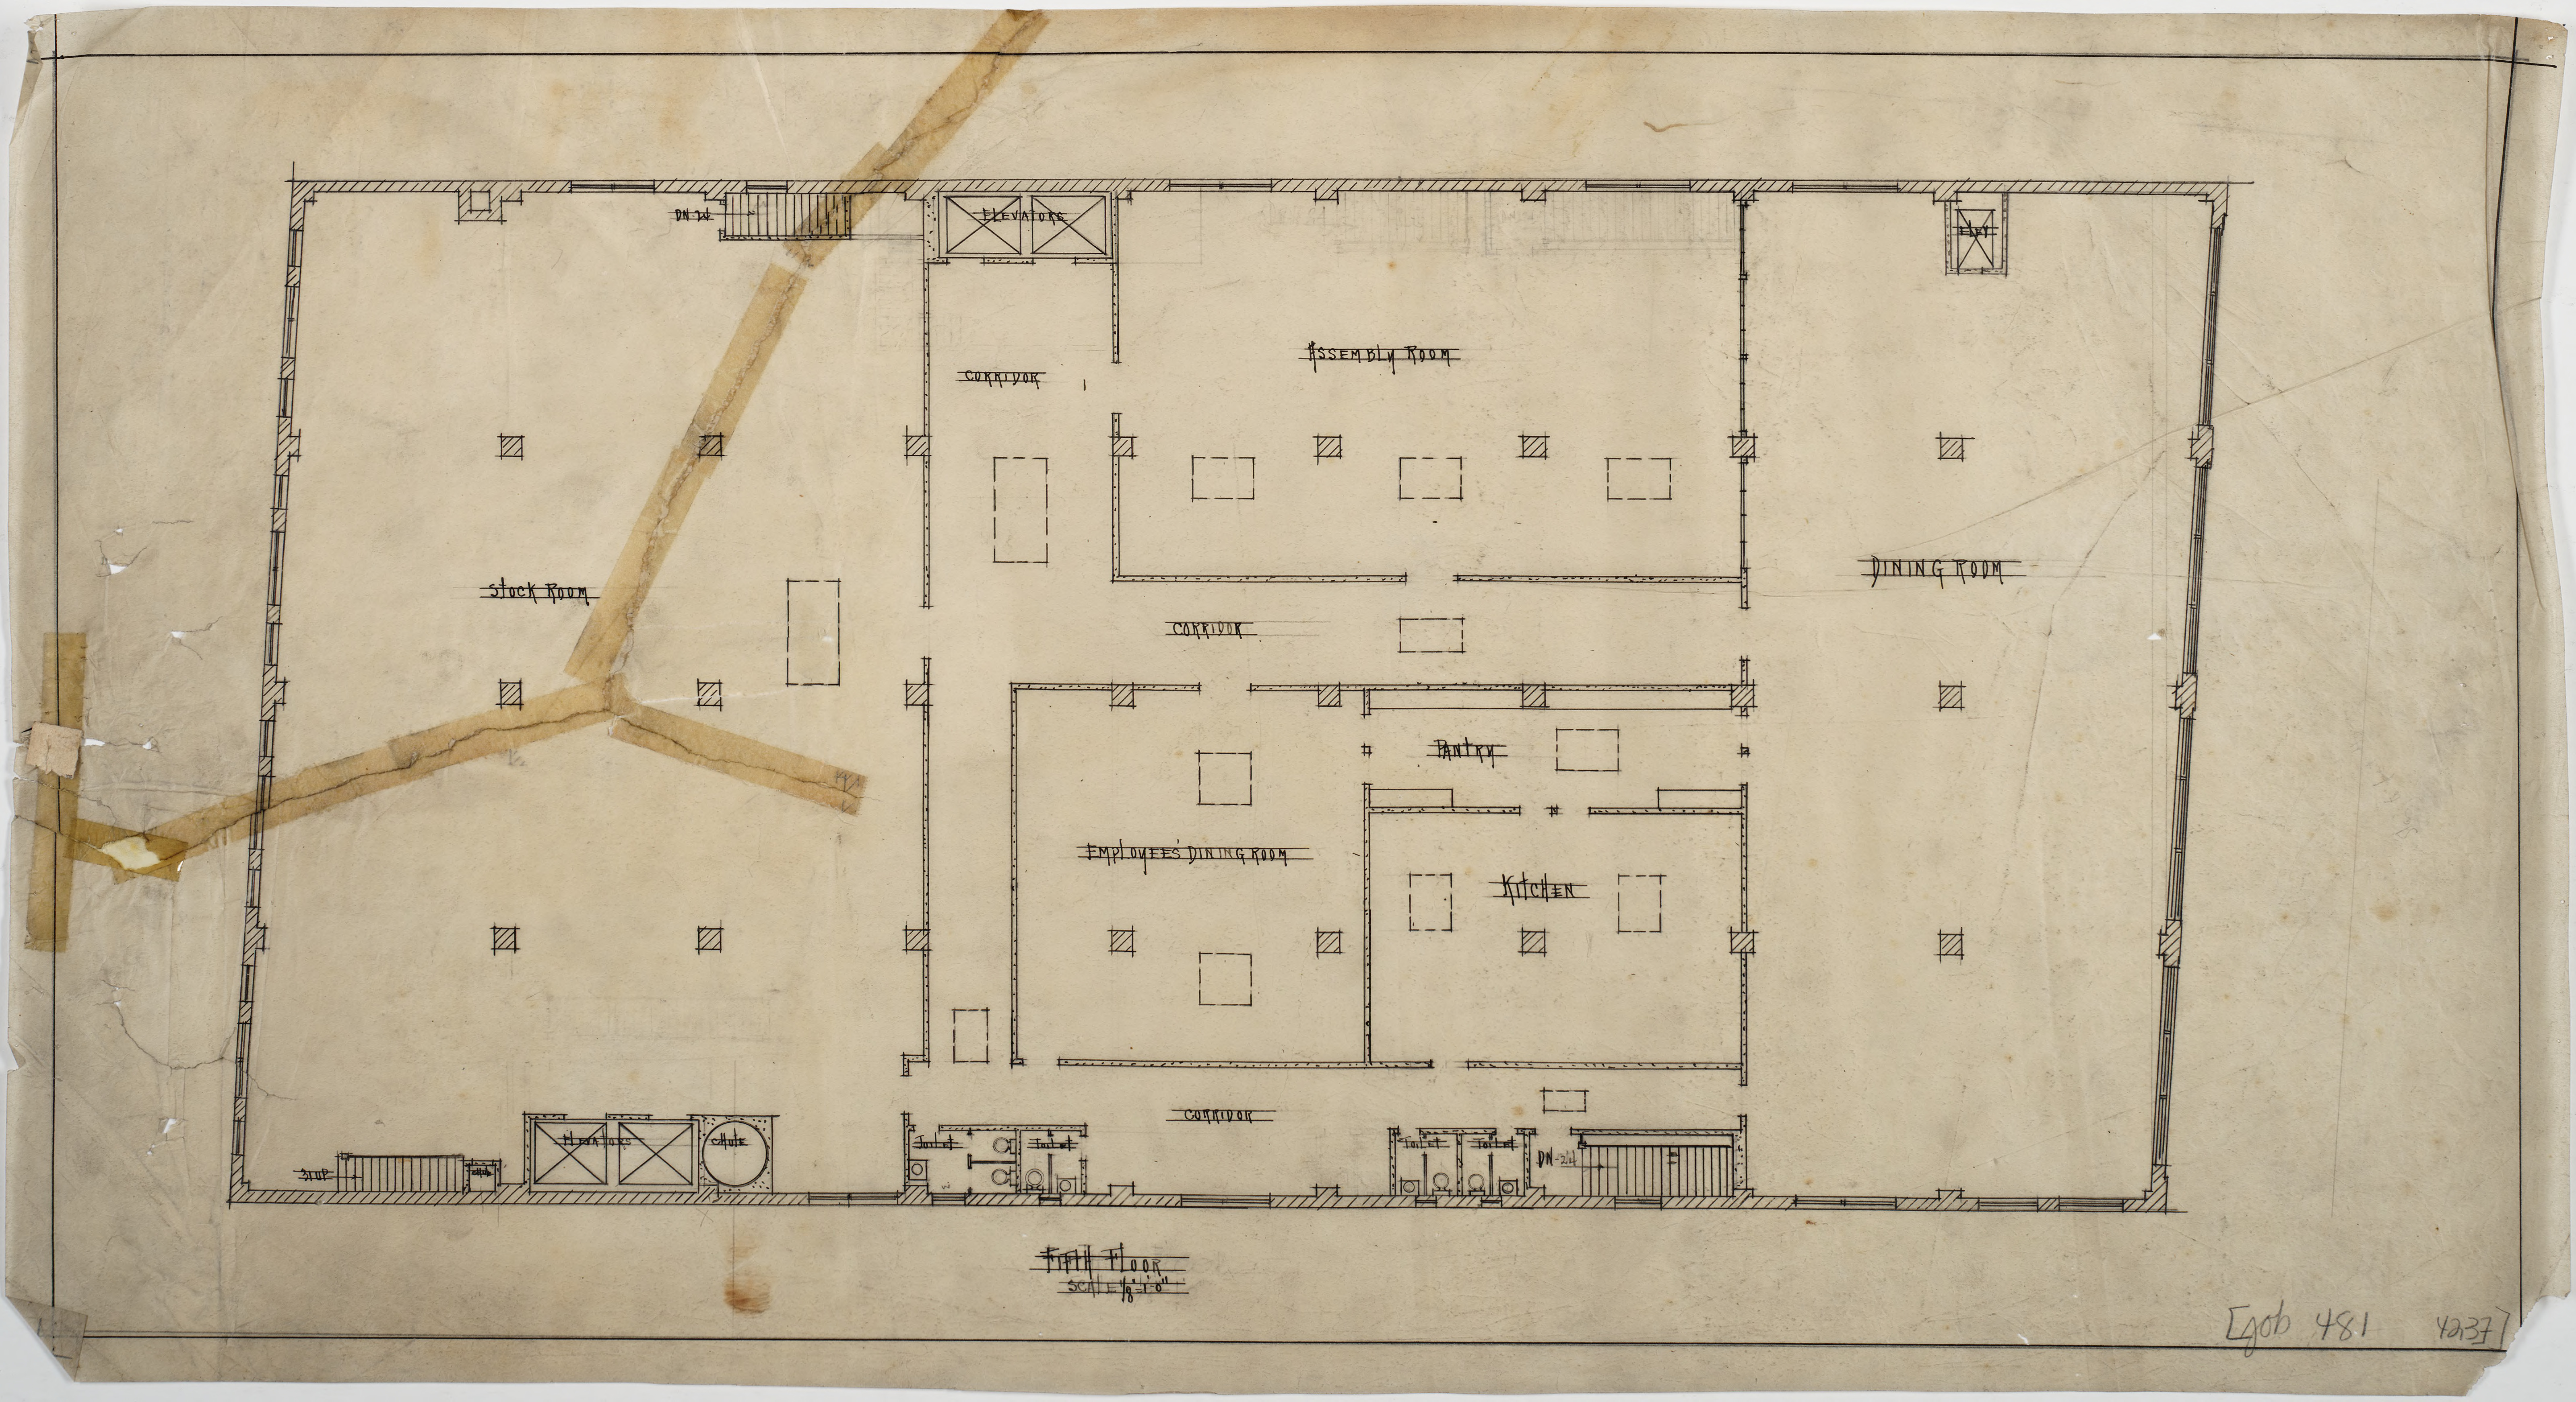 Fifth Floor Plan (Efird's Department Store (Charlotte, N.C